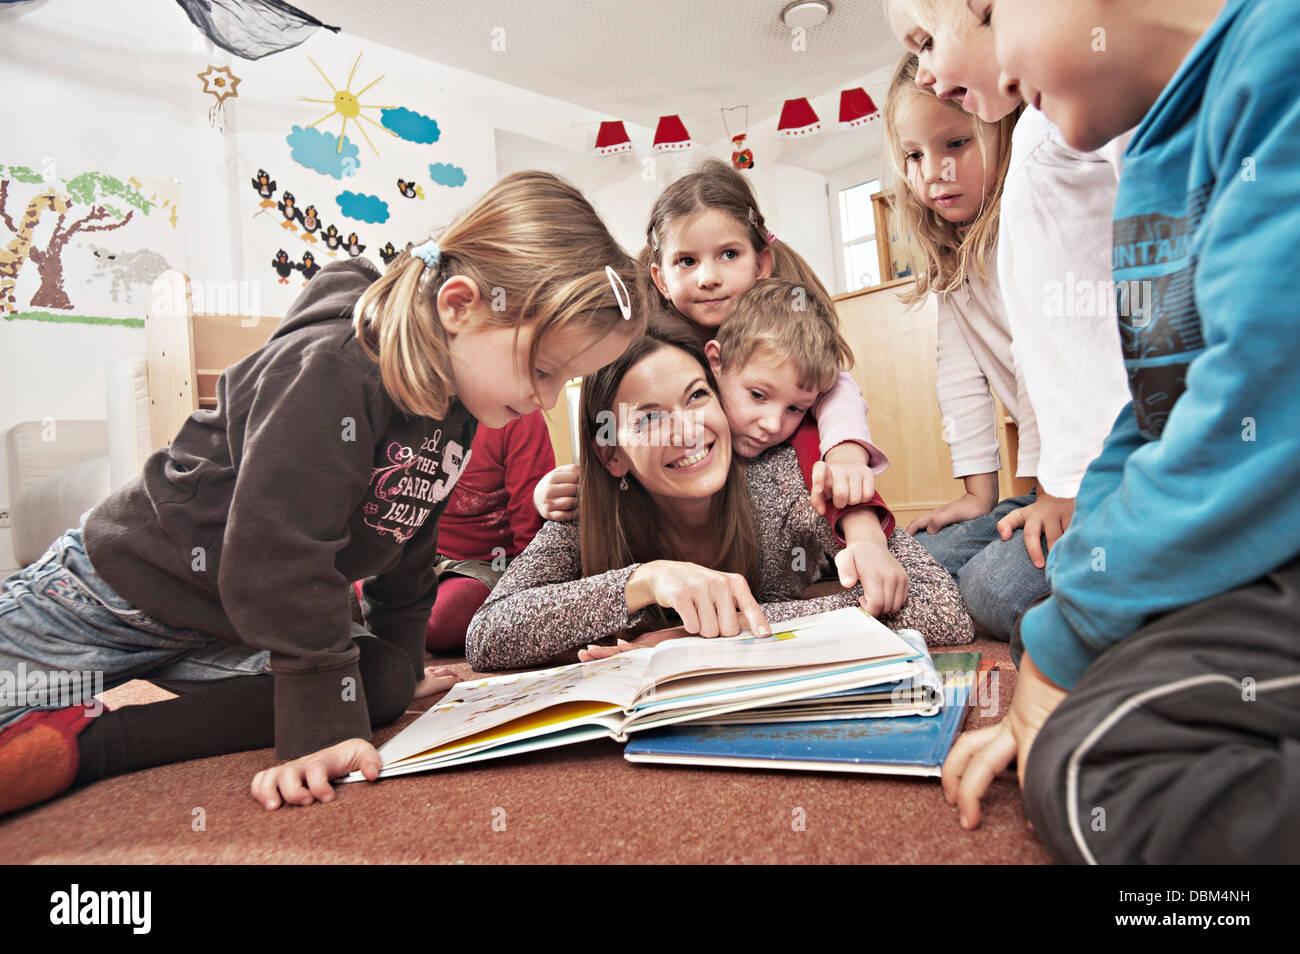 Female Carer And Children Reading A Book Together, Kottgeisering, Bavaria, Germany, Europe - Stock Image